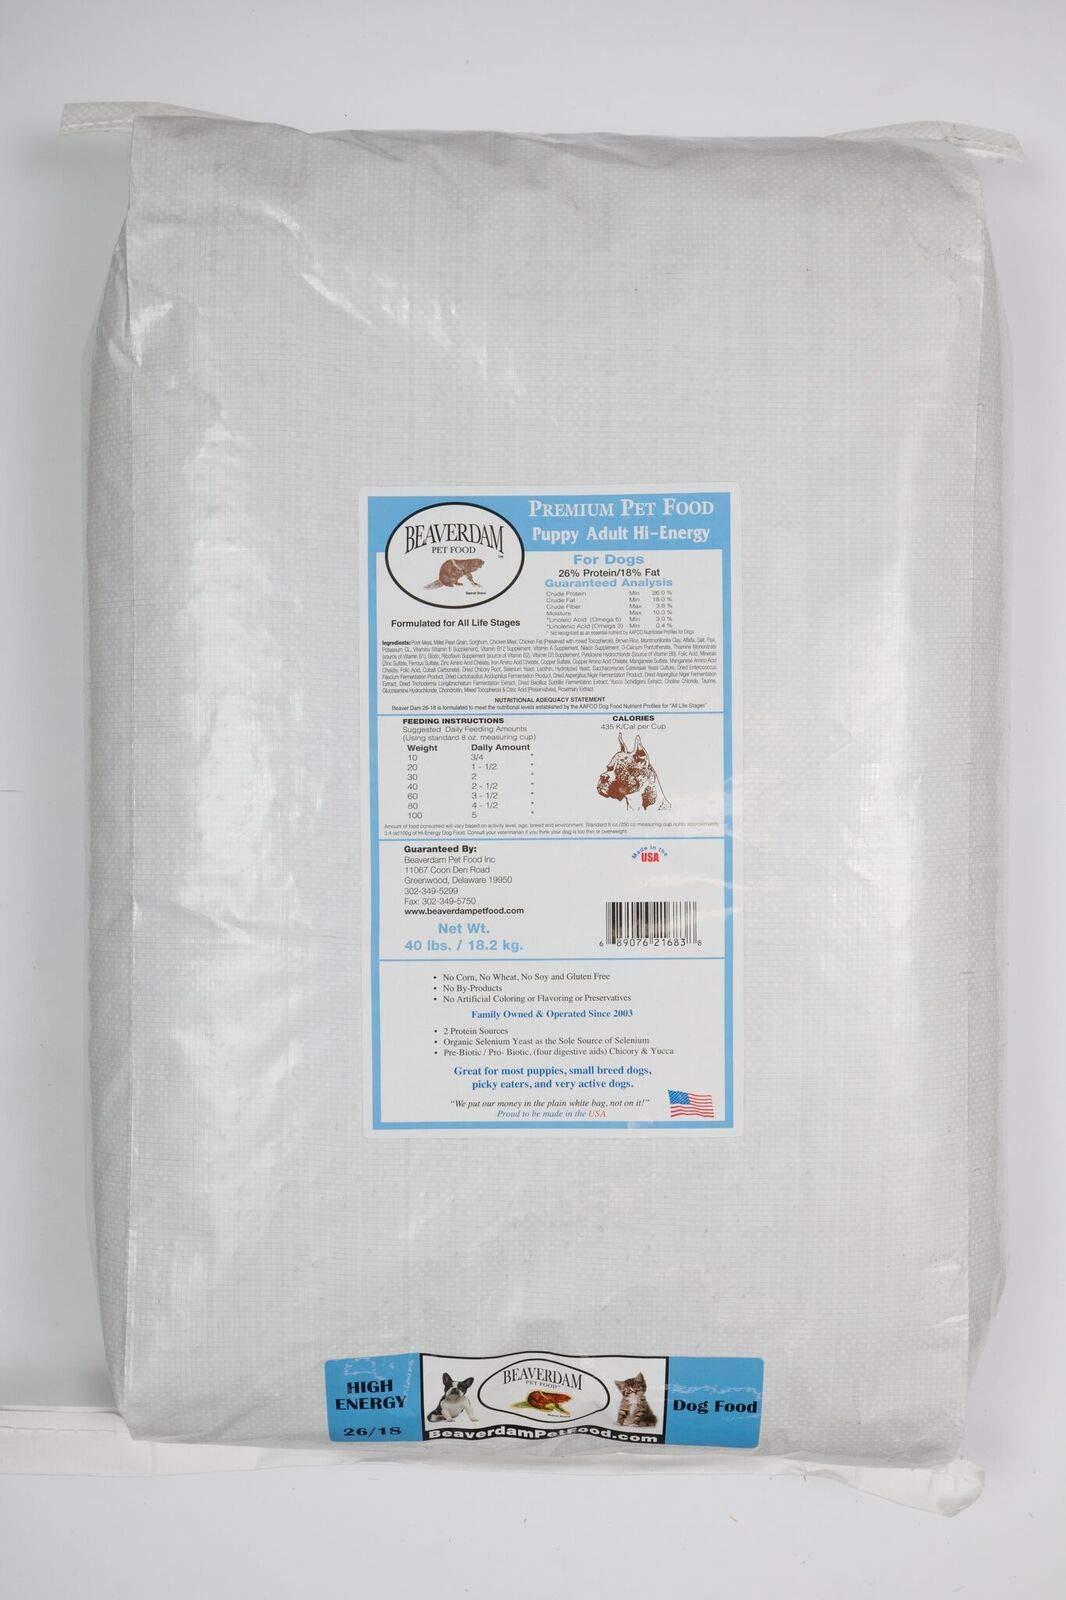 Beaverdam Pet Food, Inc. High Energy Puppy/Adult 40 lb by Beaverdam Pet Food, Inc.